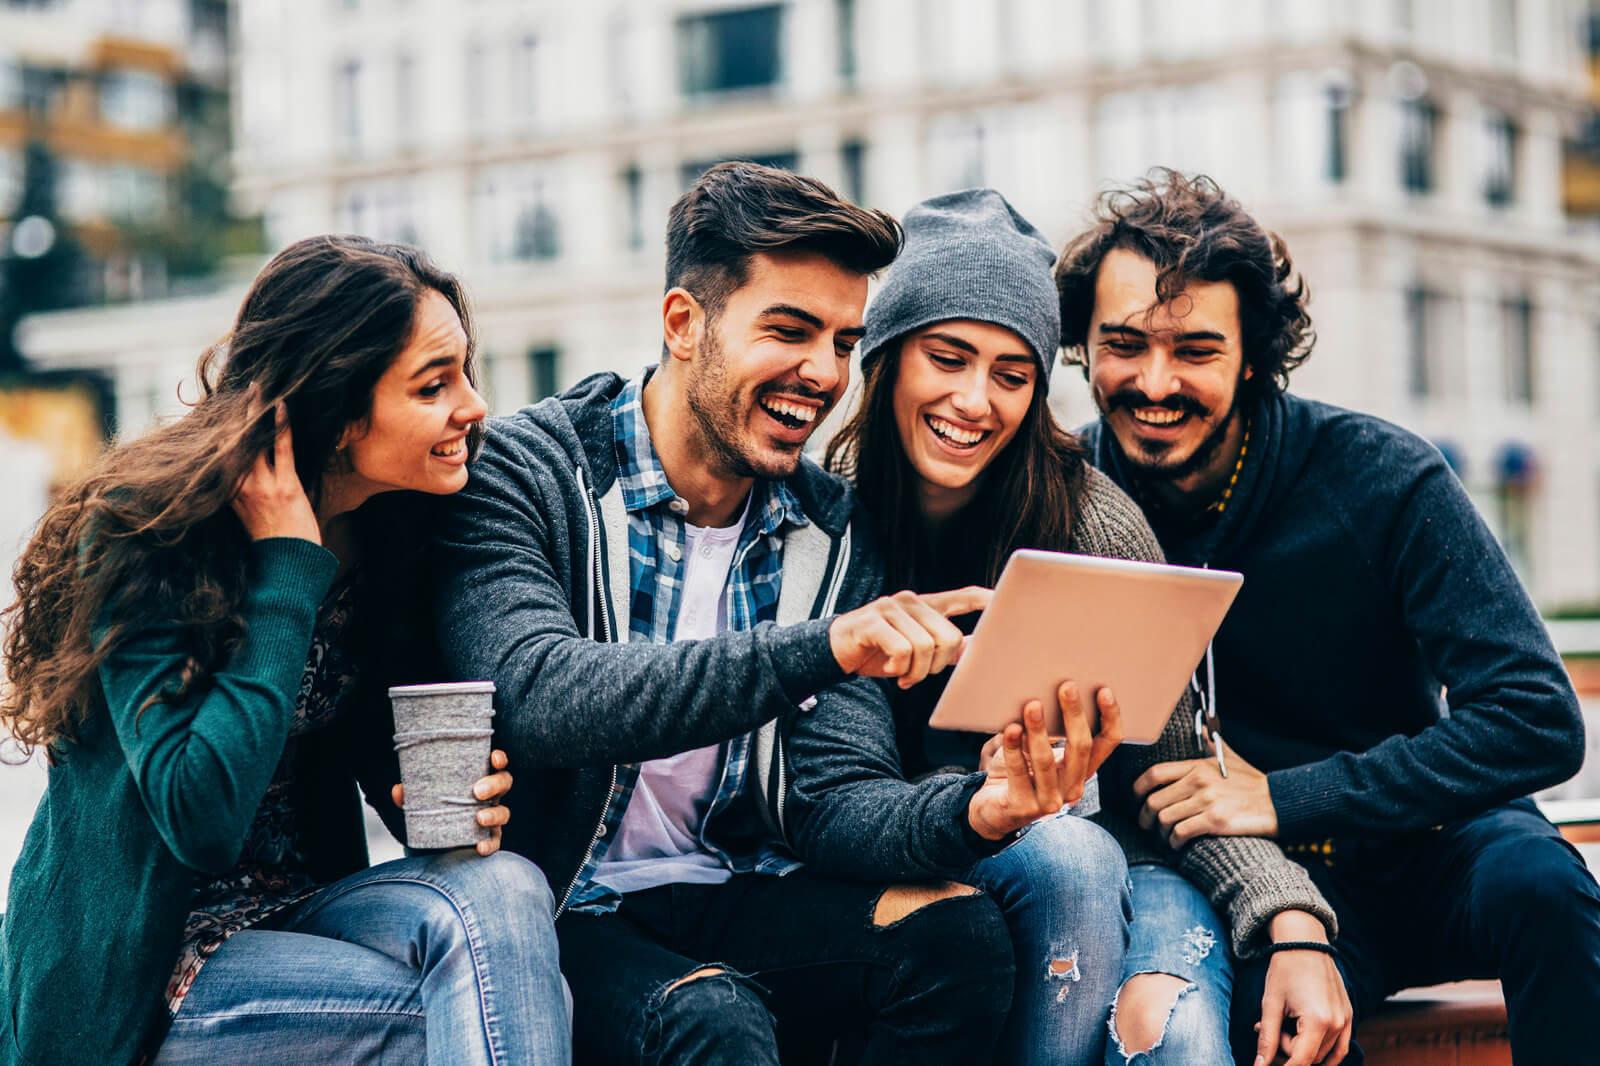 Millennials impact investing